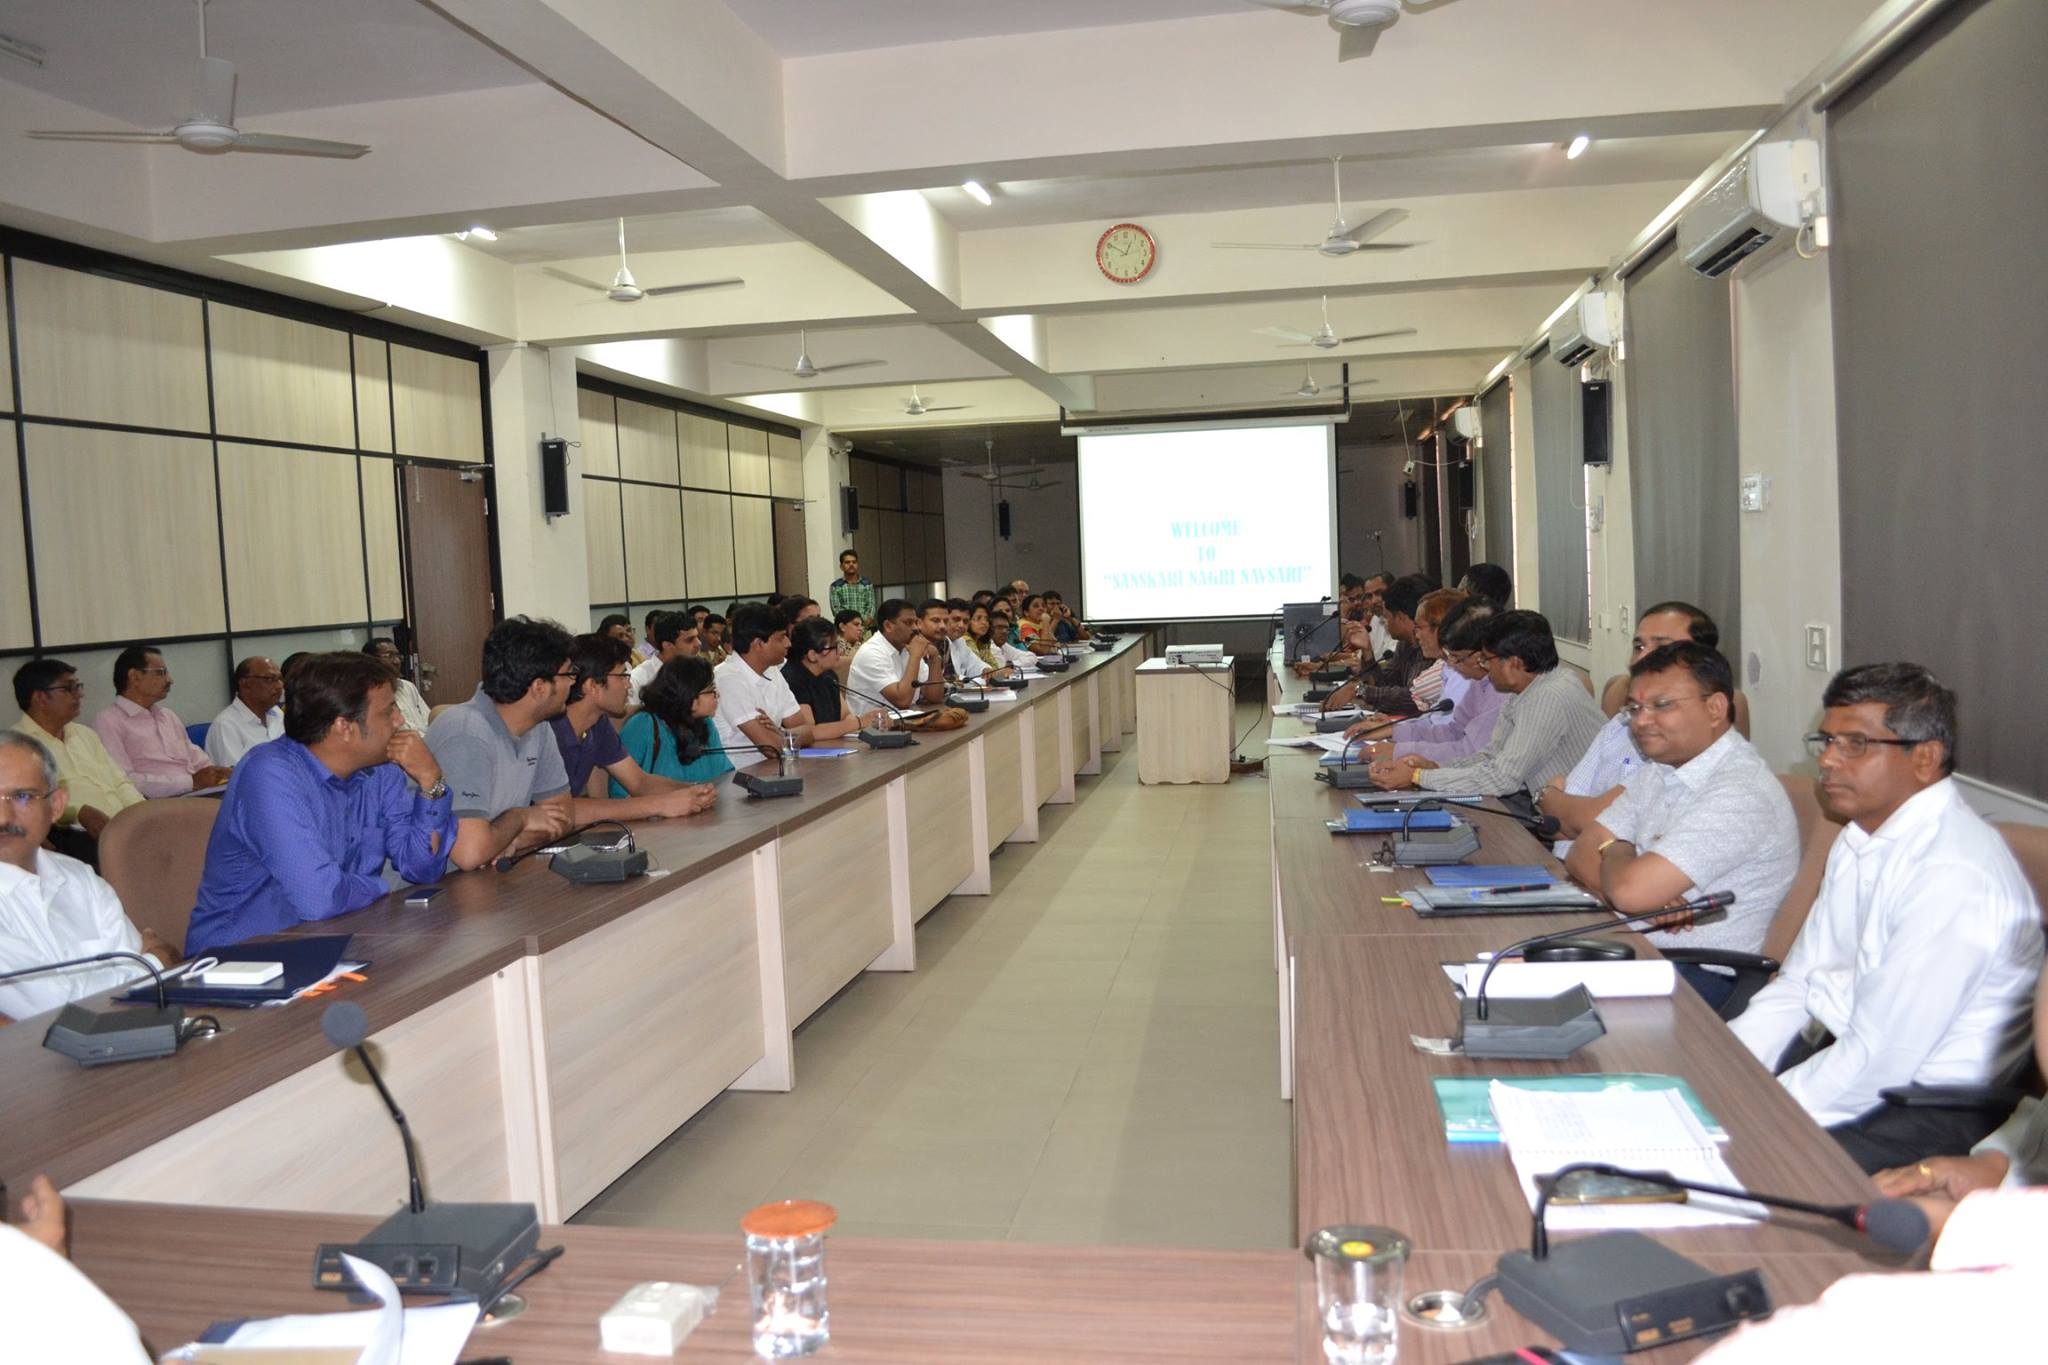 During the presentation of Advantage Bha